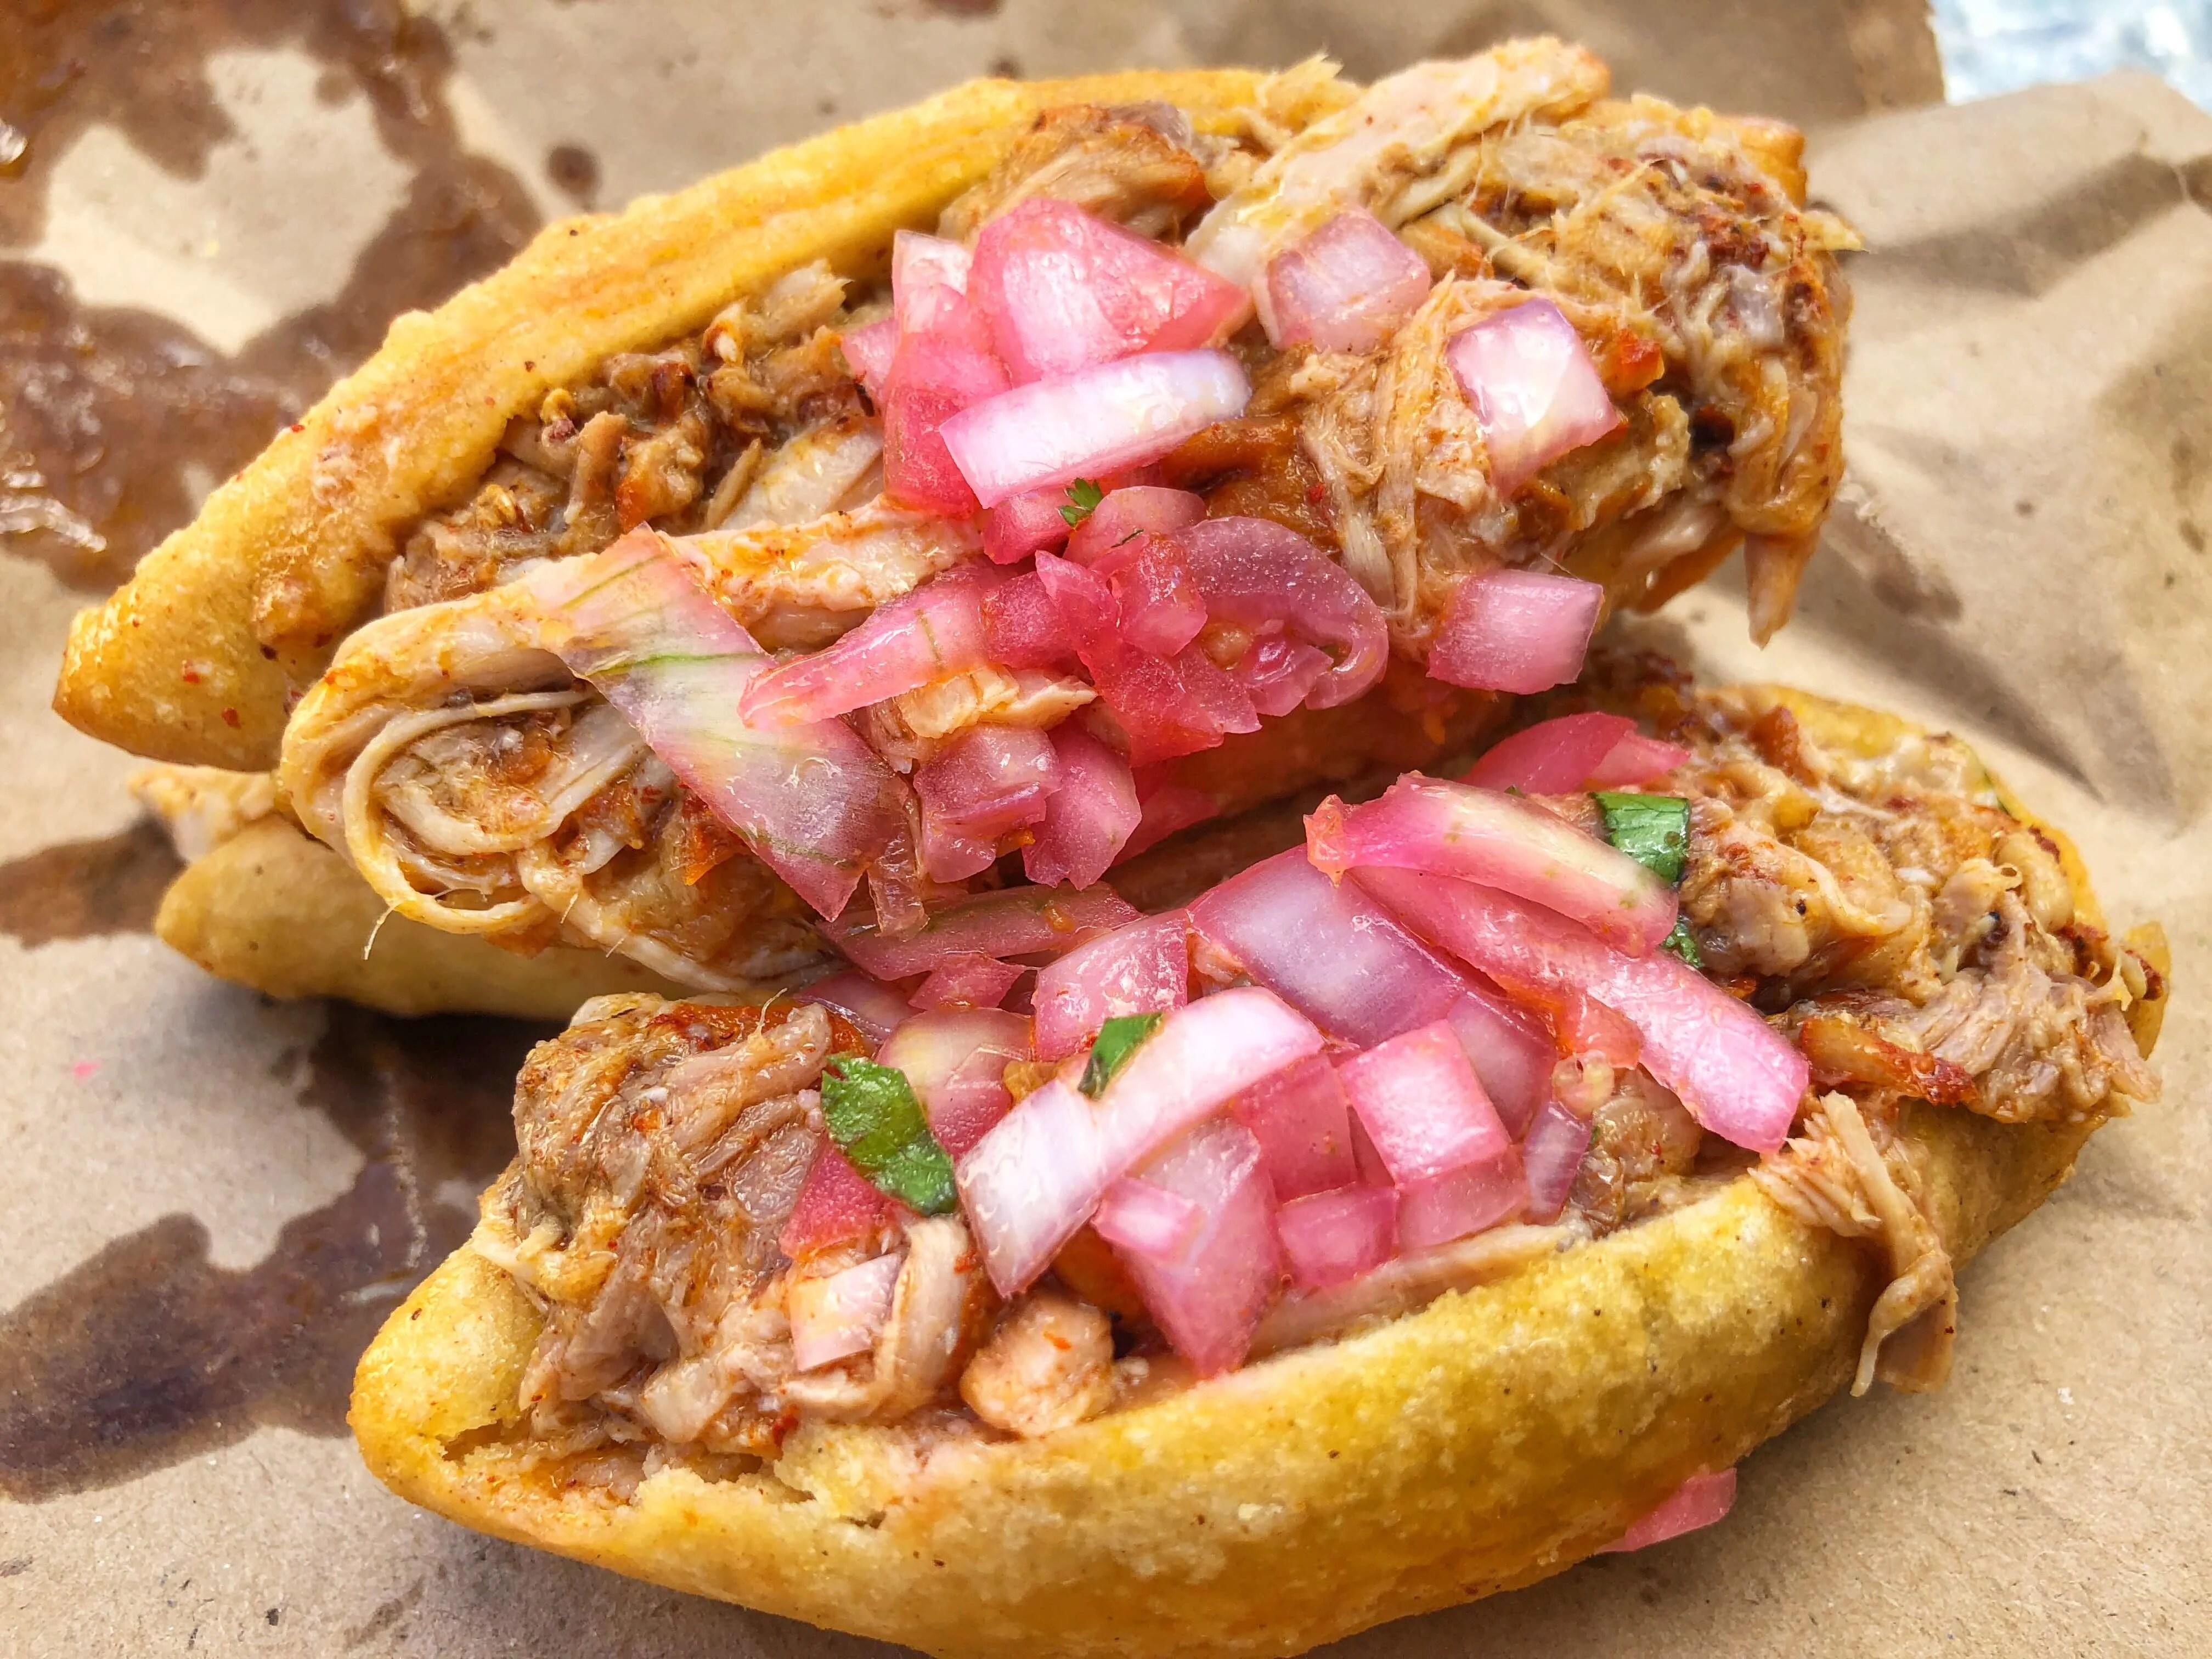 Yucatan Food, Yucatan Cuisine, Mayan dishes, Mayan Food, Yucatan Foods